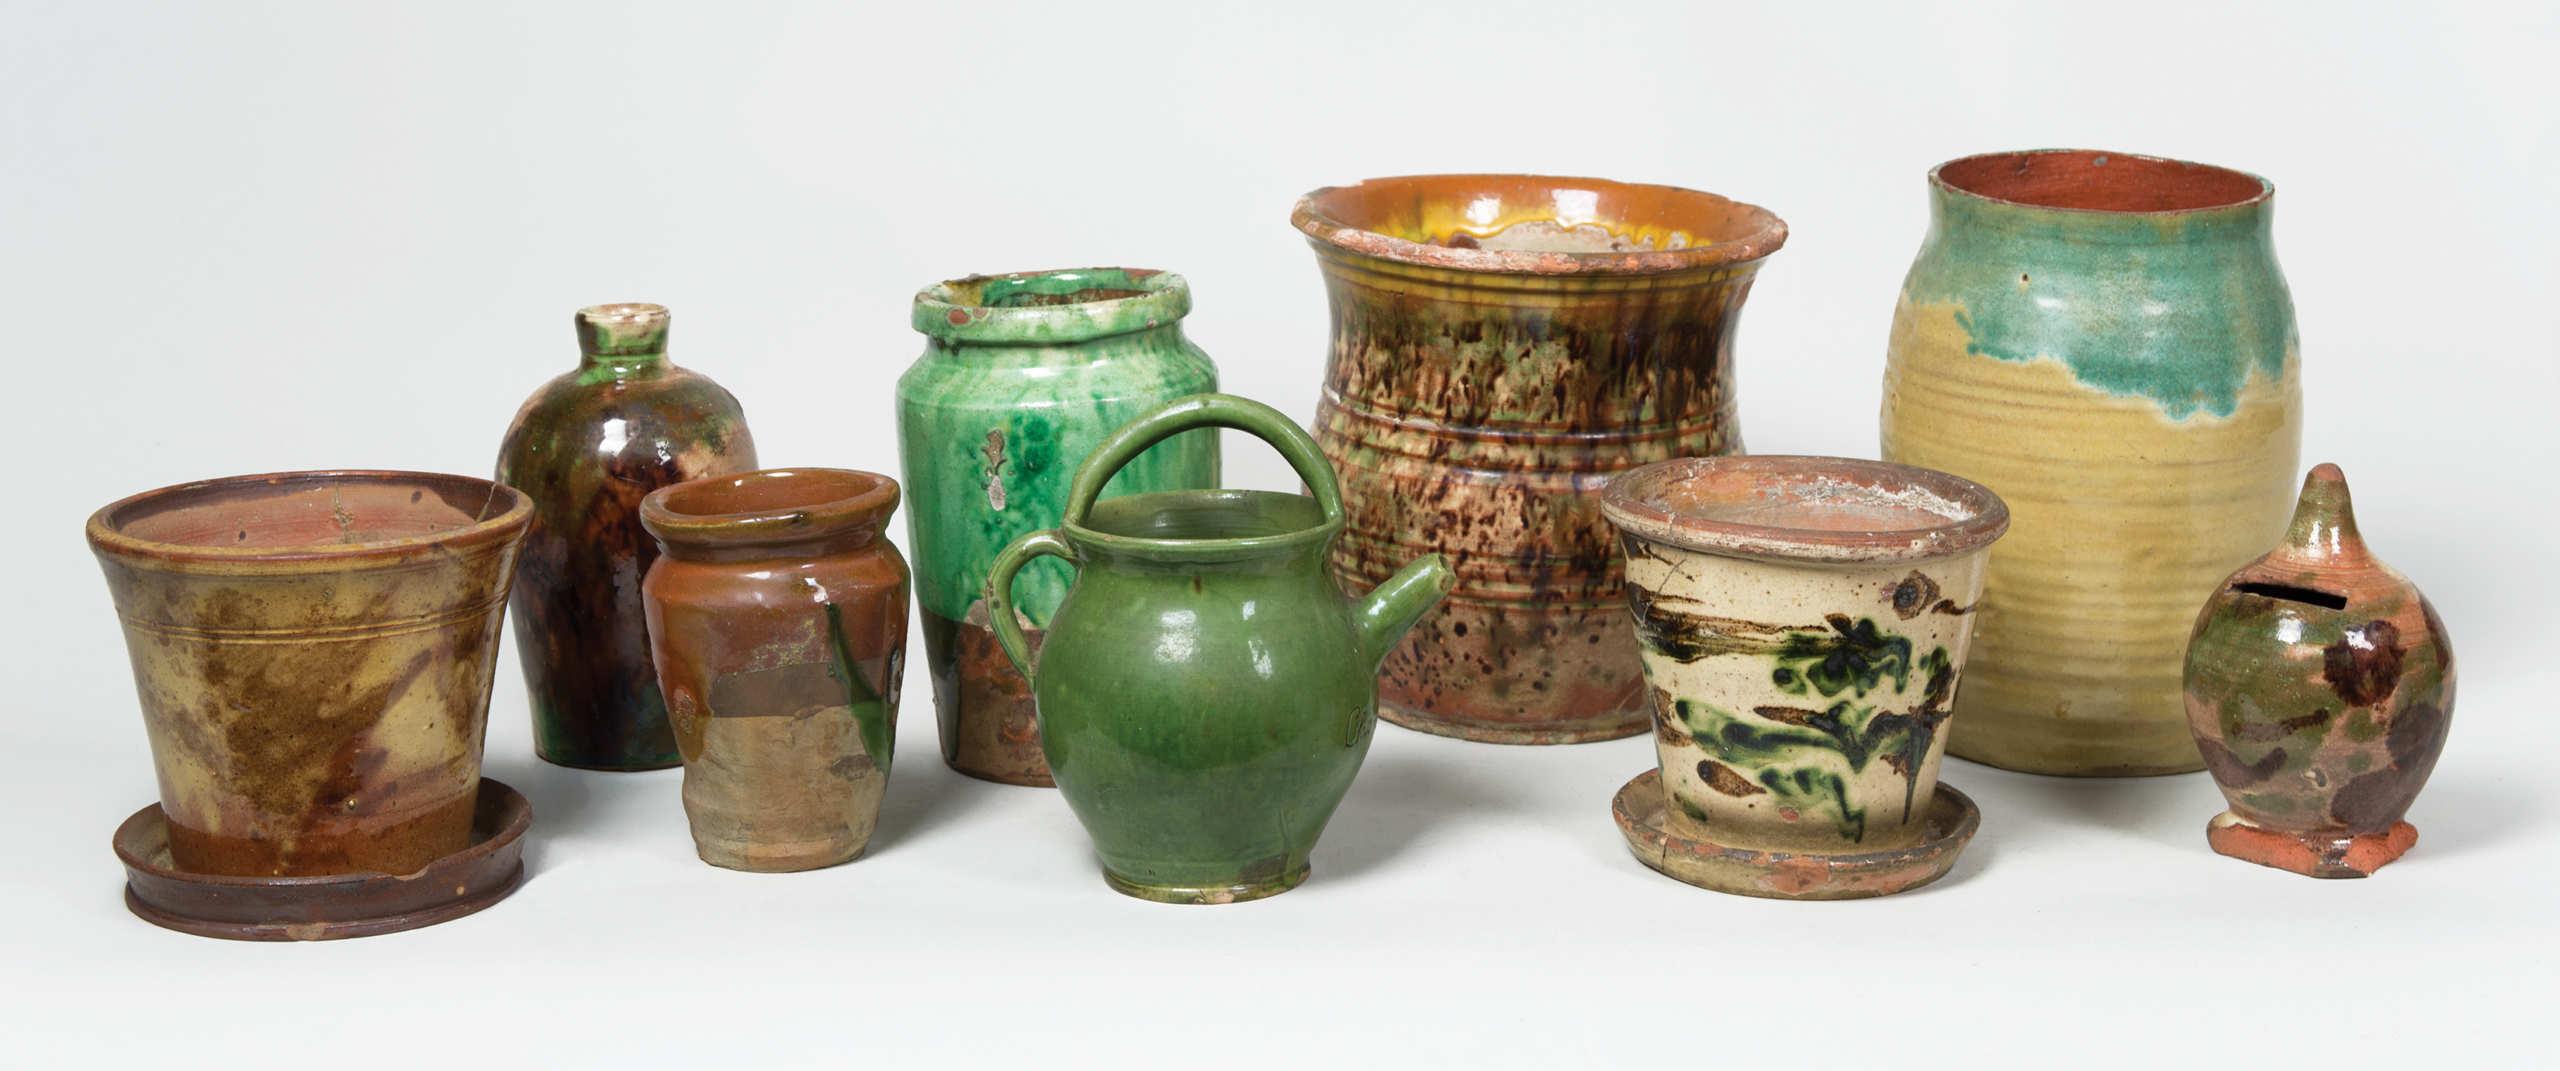 redware, jars, planters, bank, bottle